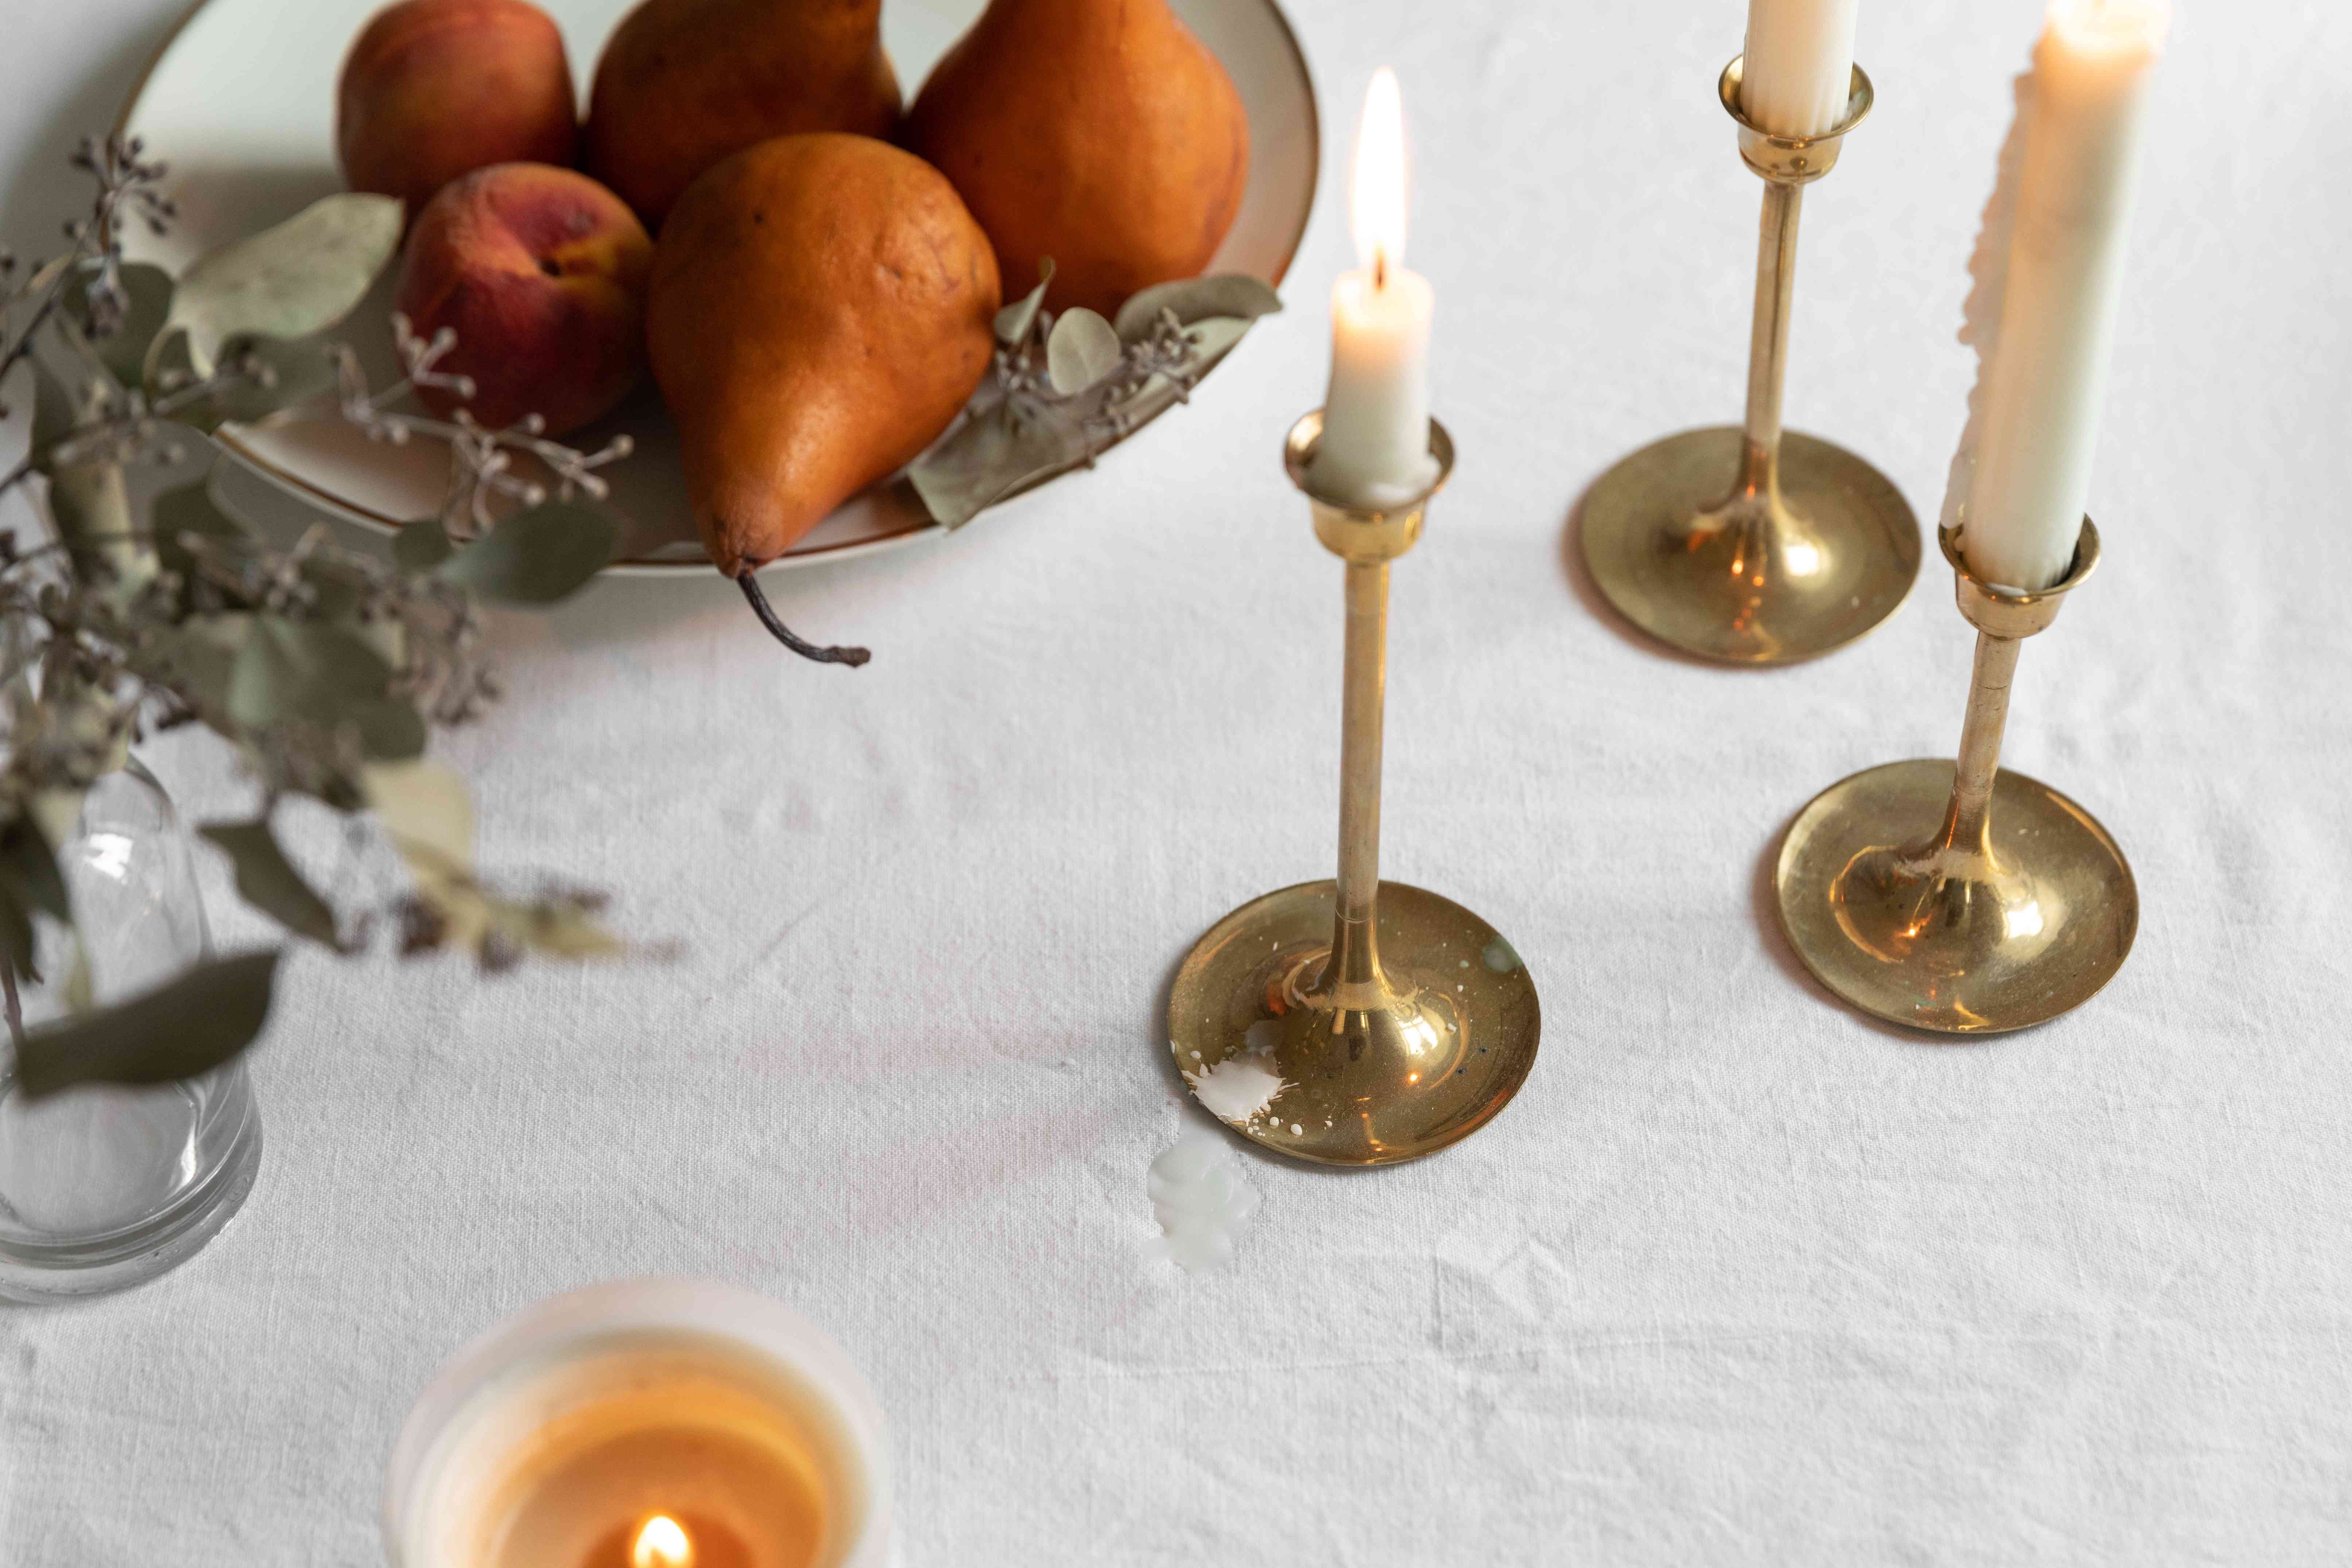 candlesticks on a dinner table